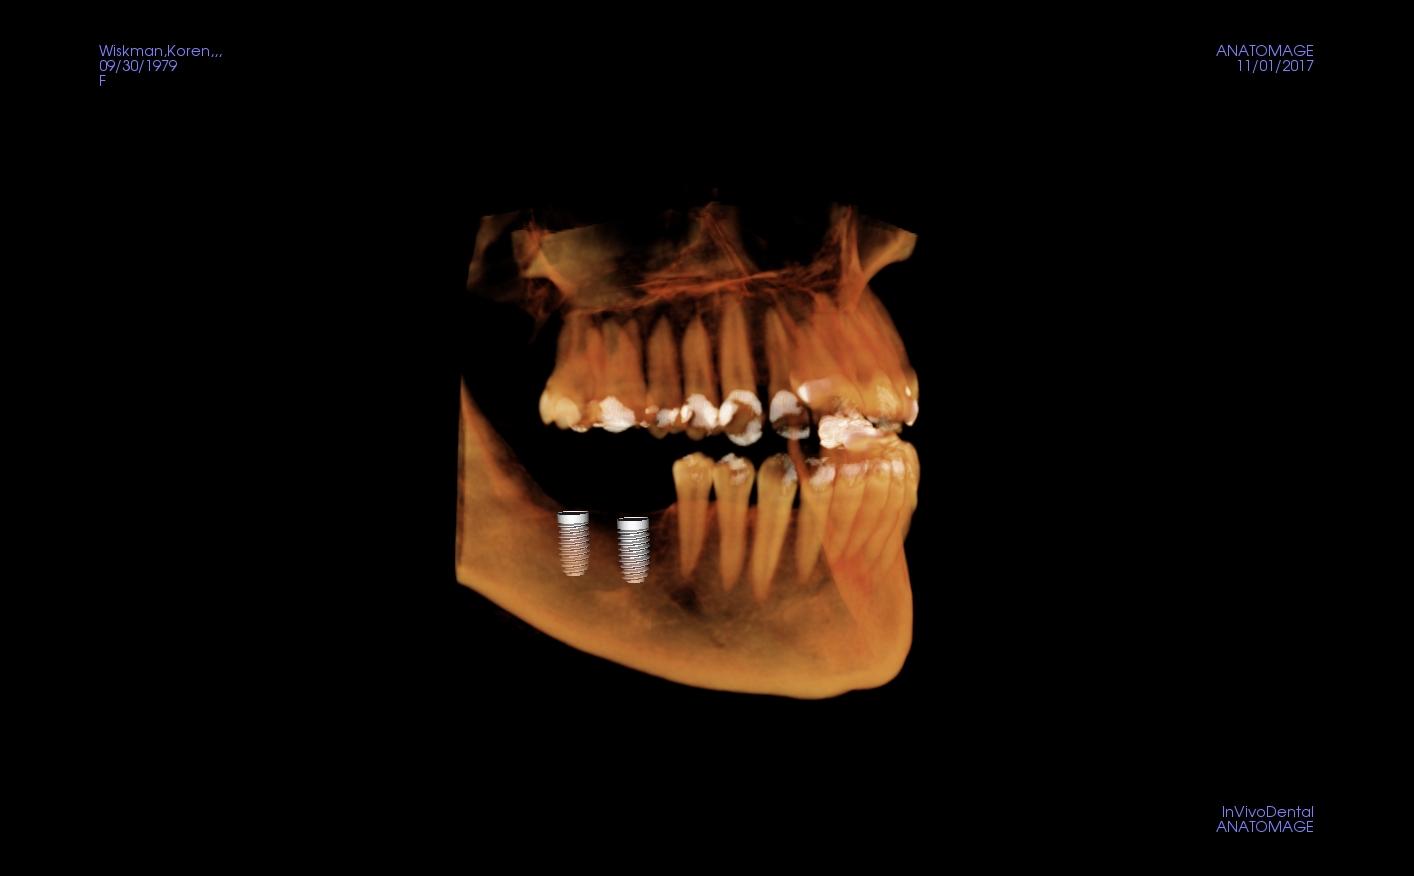 Kori mandibular implants